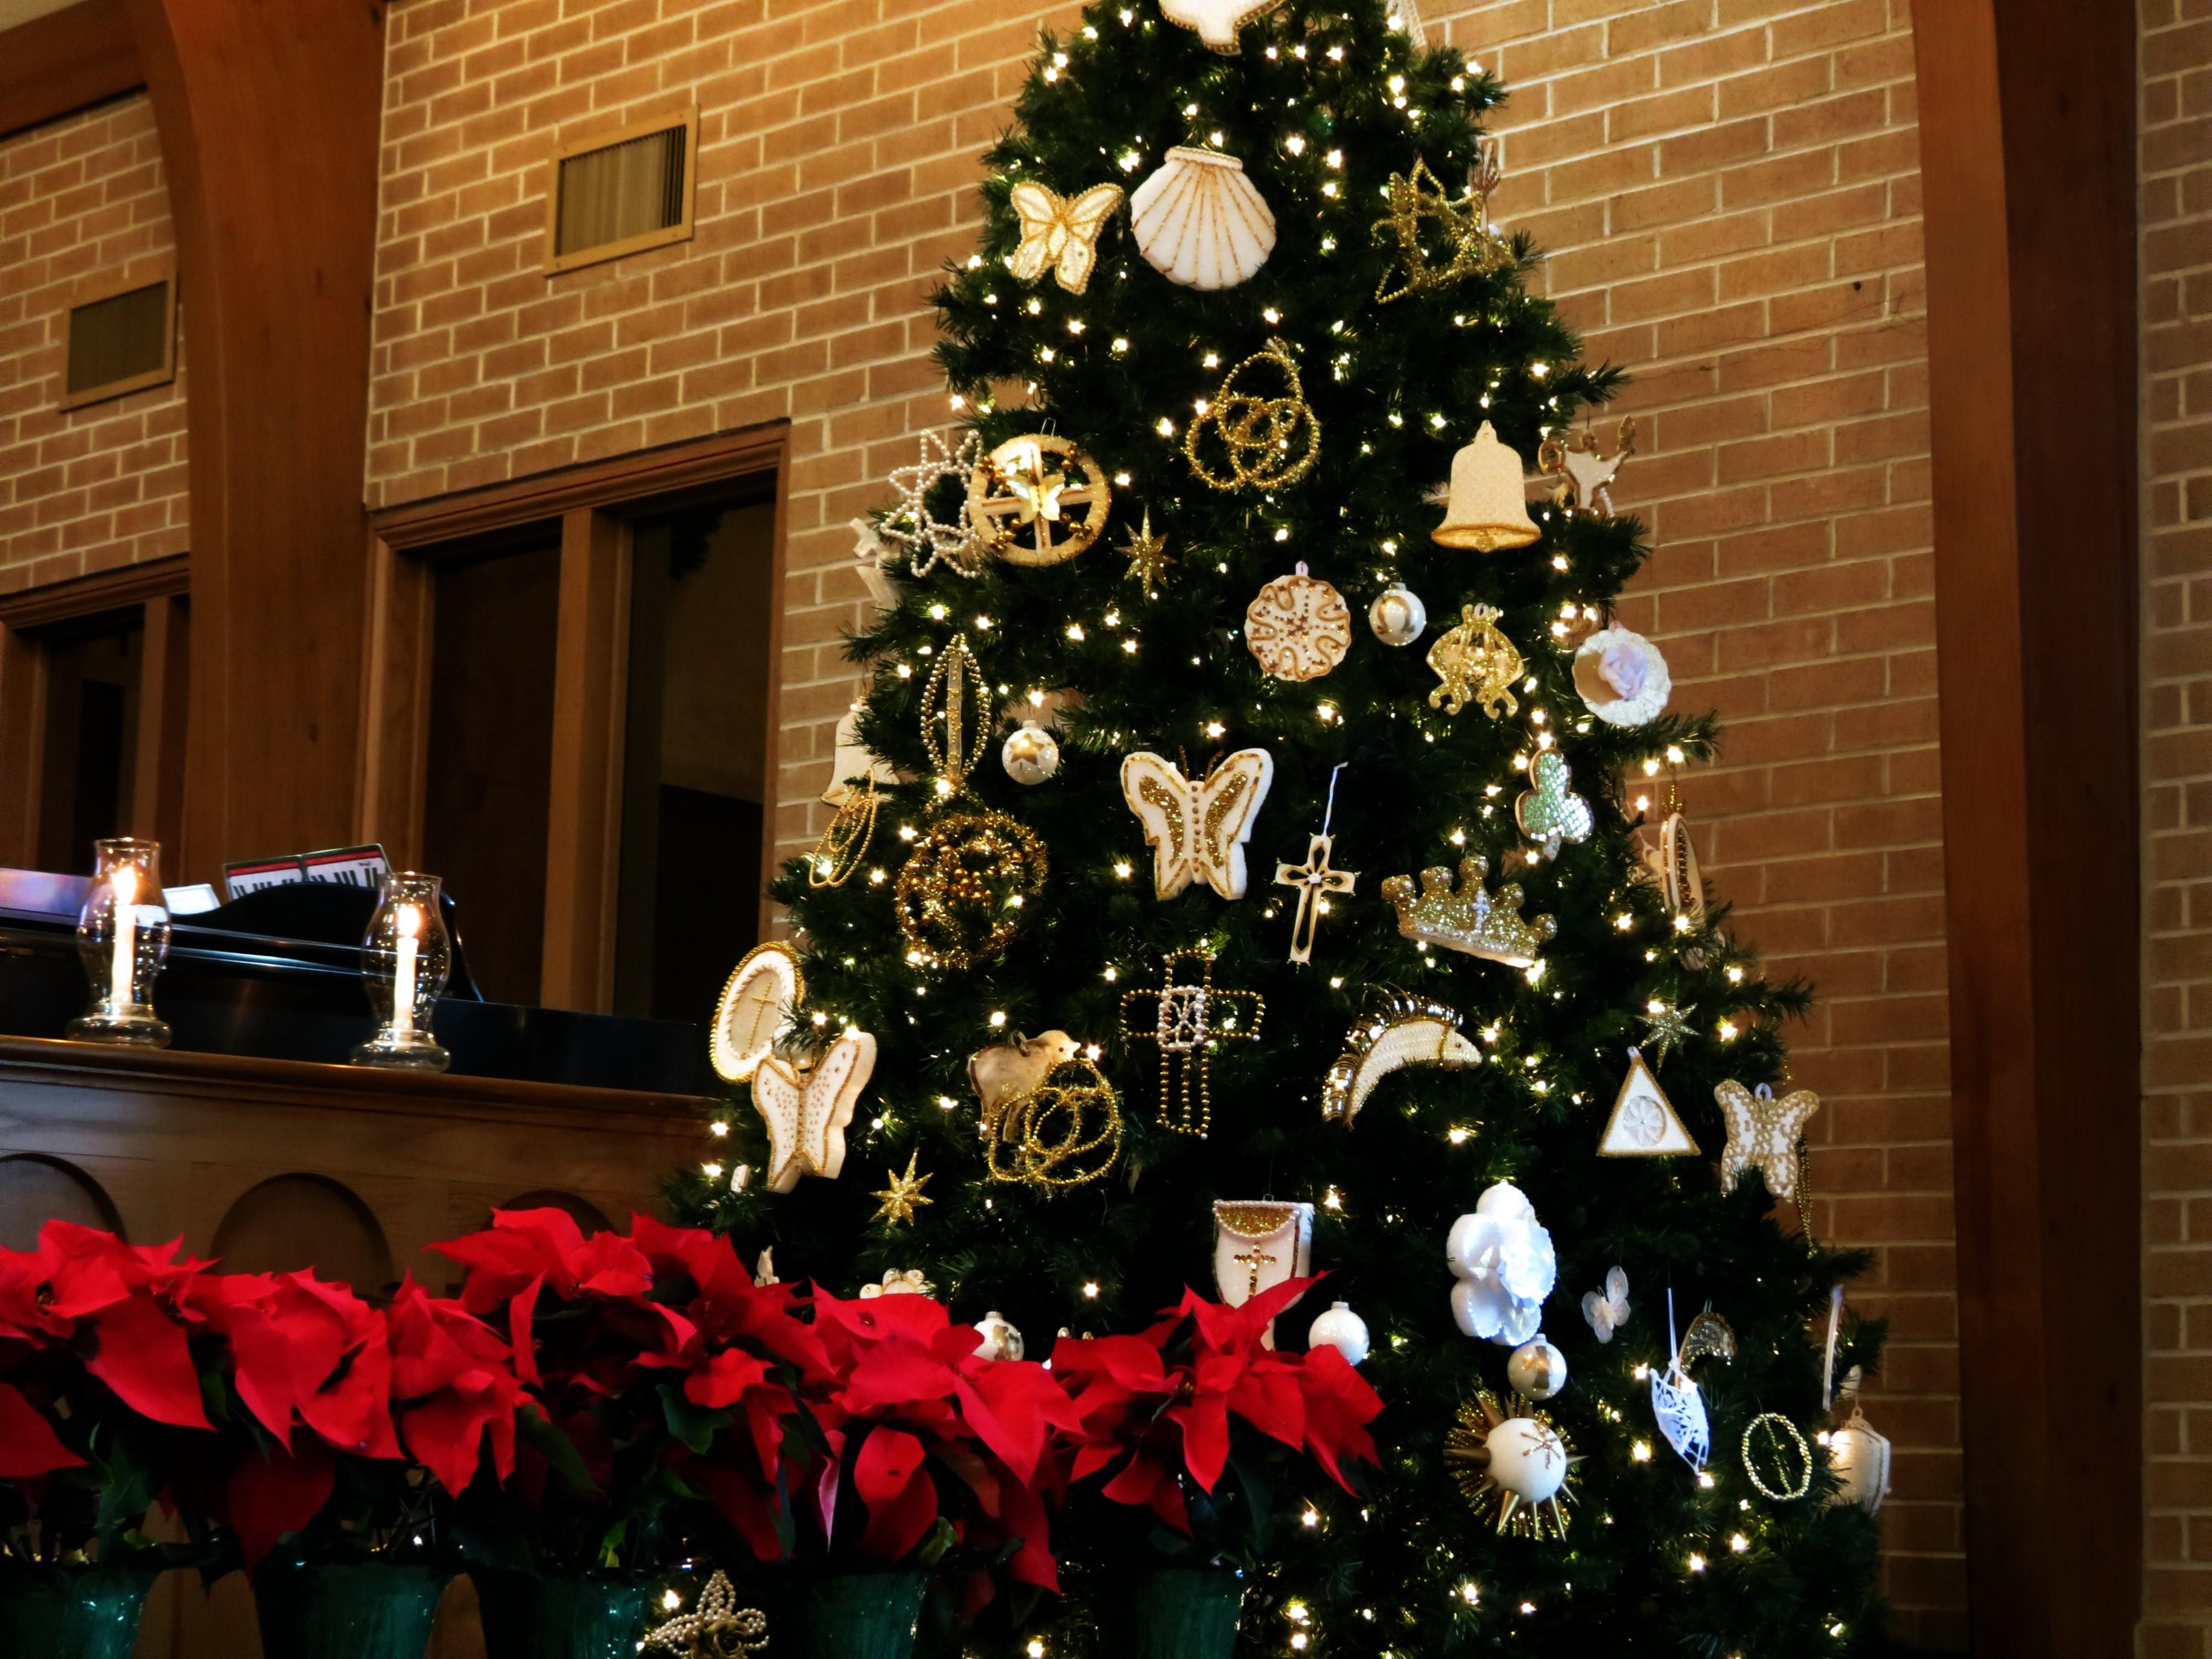 The Chrismon tree stands tall in the sanctuary of Cornelia United Methodist Church in Cornelia, Georgia. Photo by Claire DeLand, courtesy of Creative Commons.